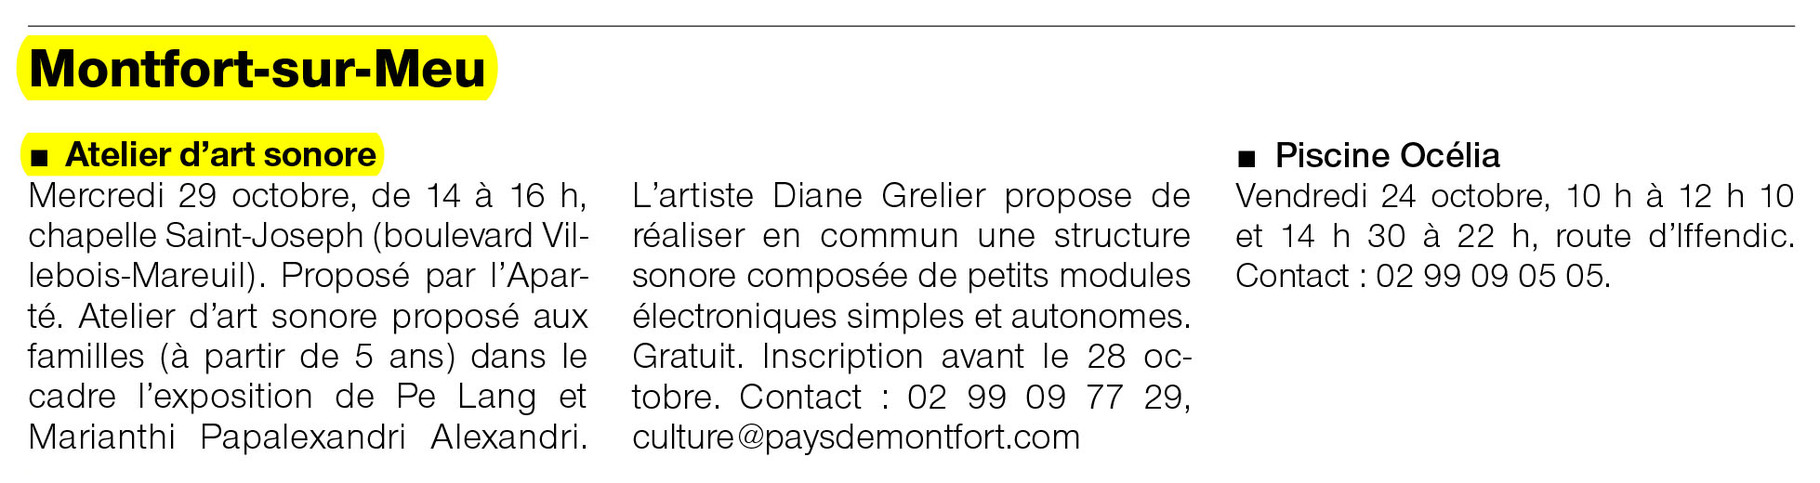 Ouest-France - 24 octobre 2014